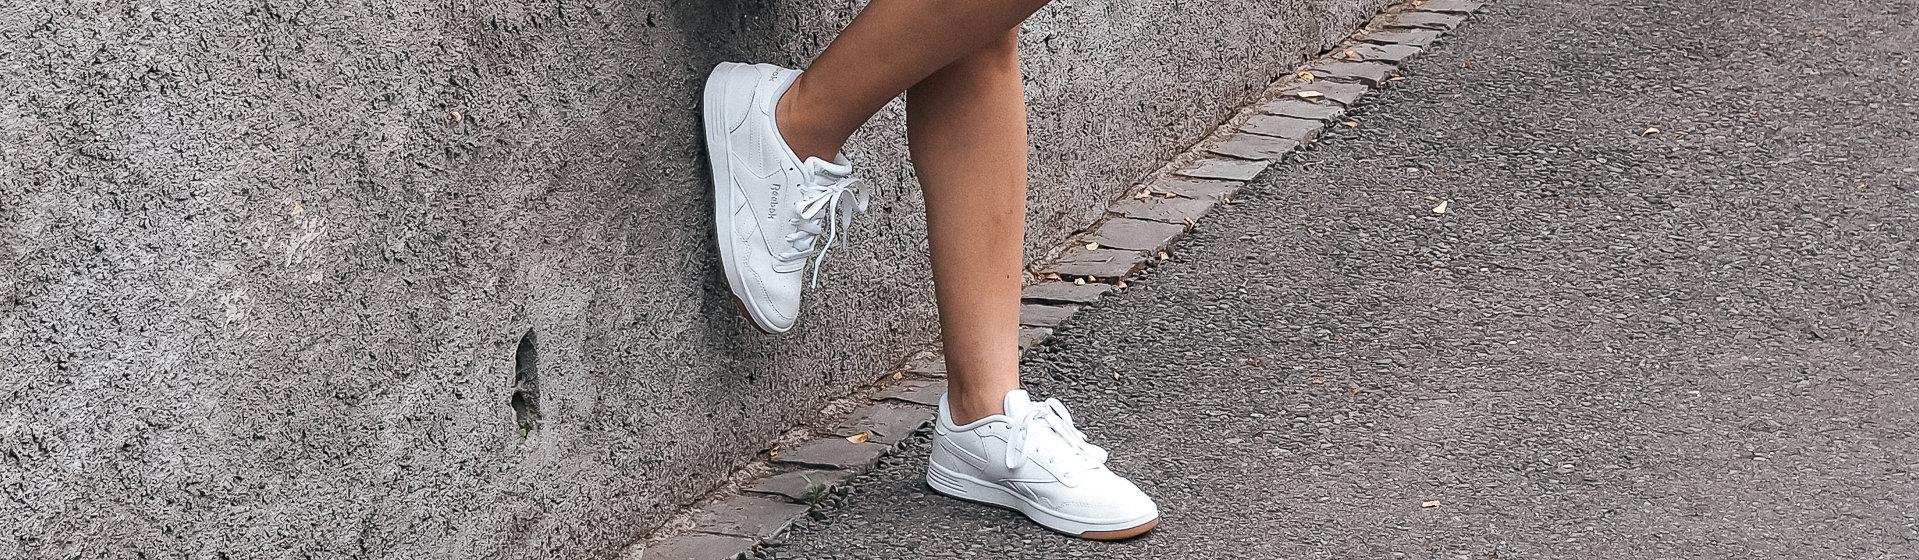 Sneakers Zum Kleid Kombinieren Shoelove By Dosenbach